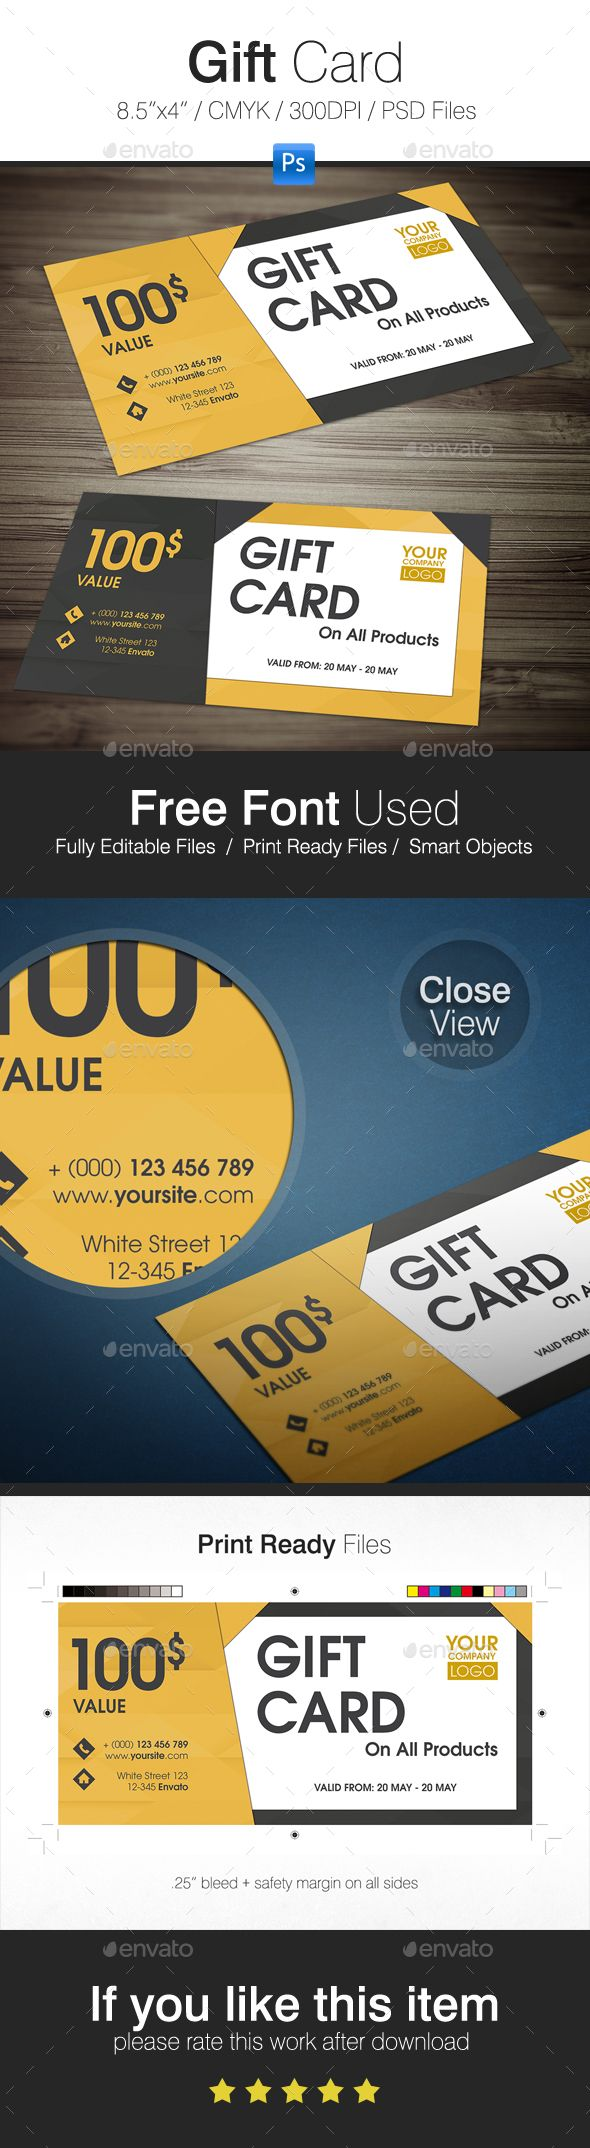 E40122963719b443b00a69b79f1854ecg gift card template psd yelopaper Gallery